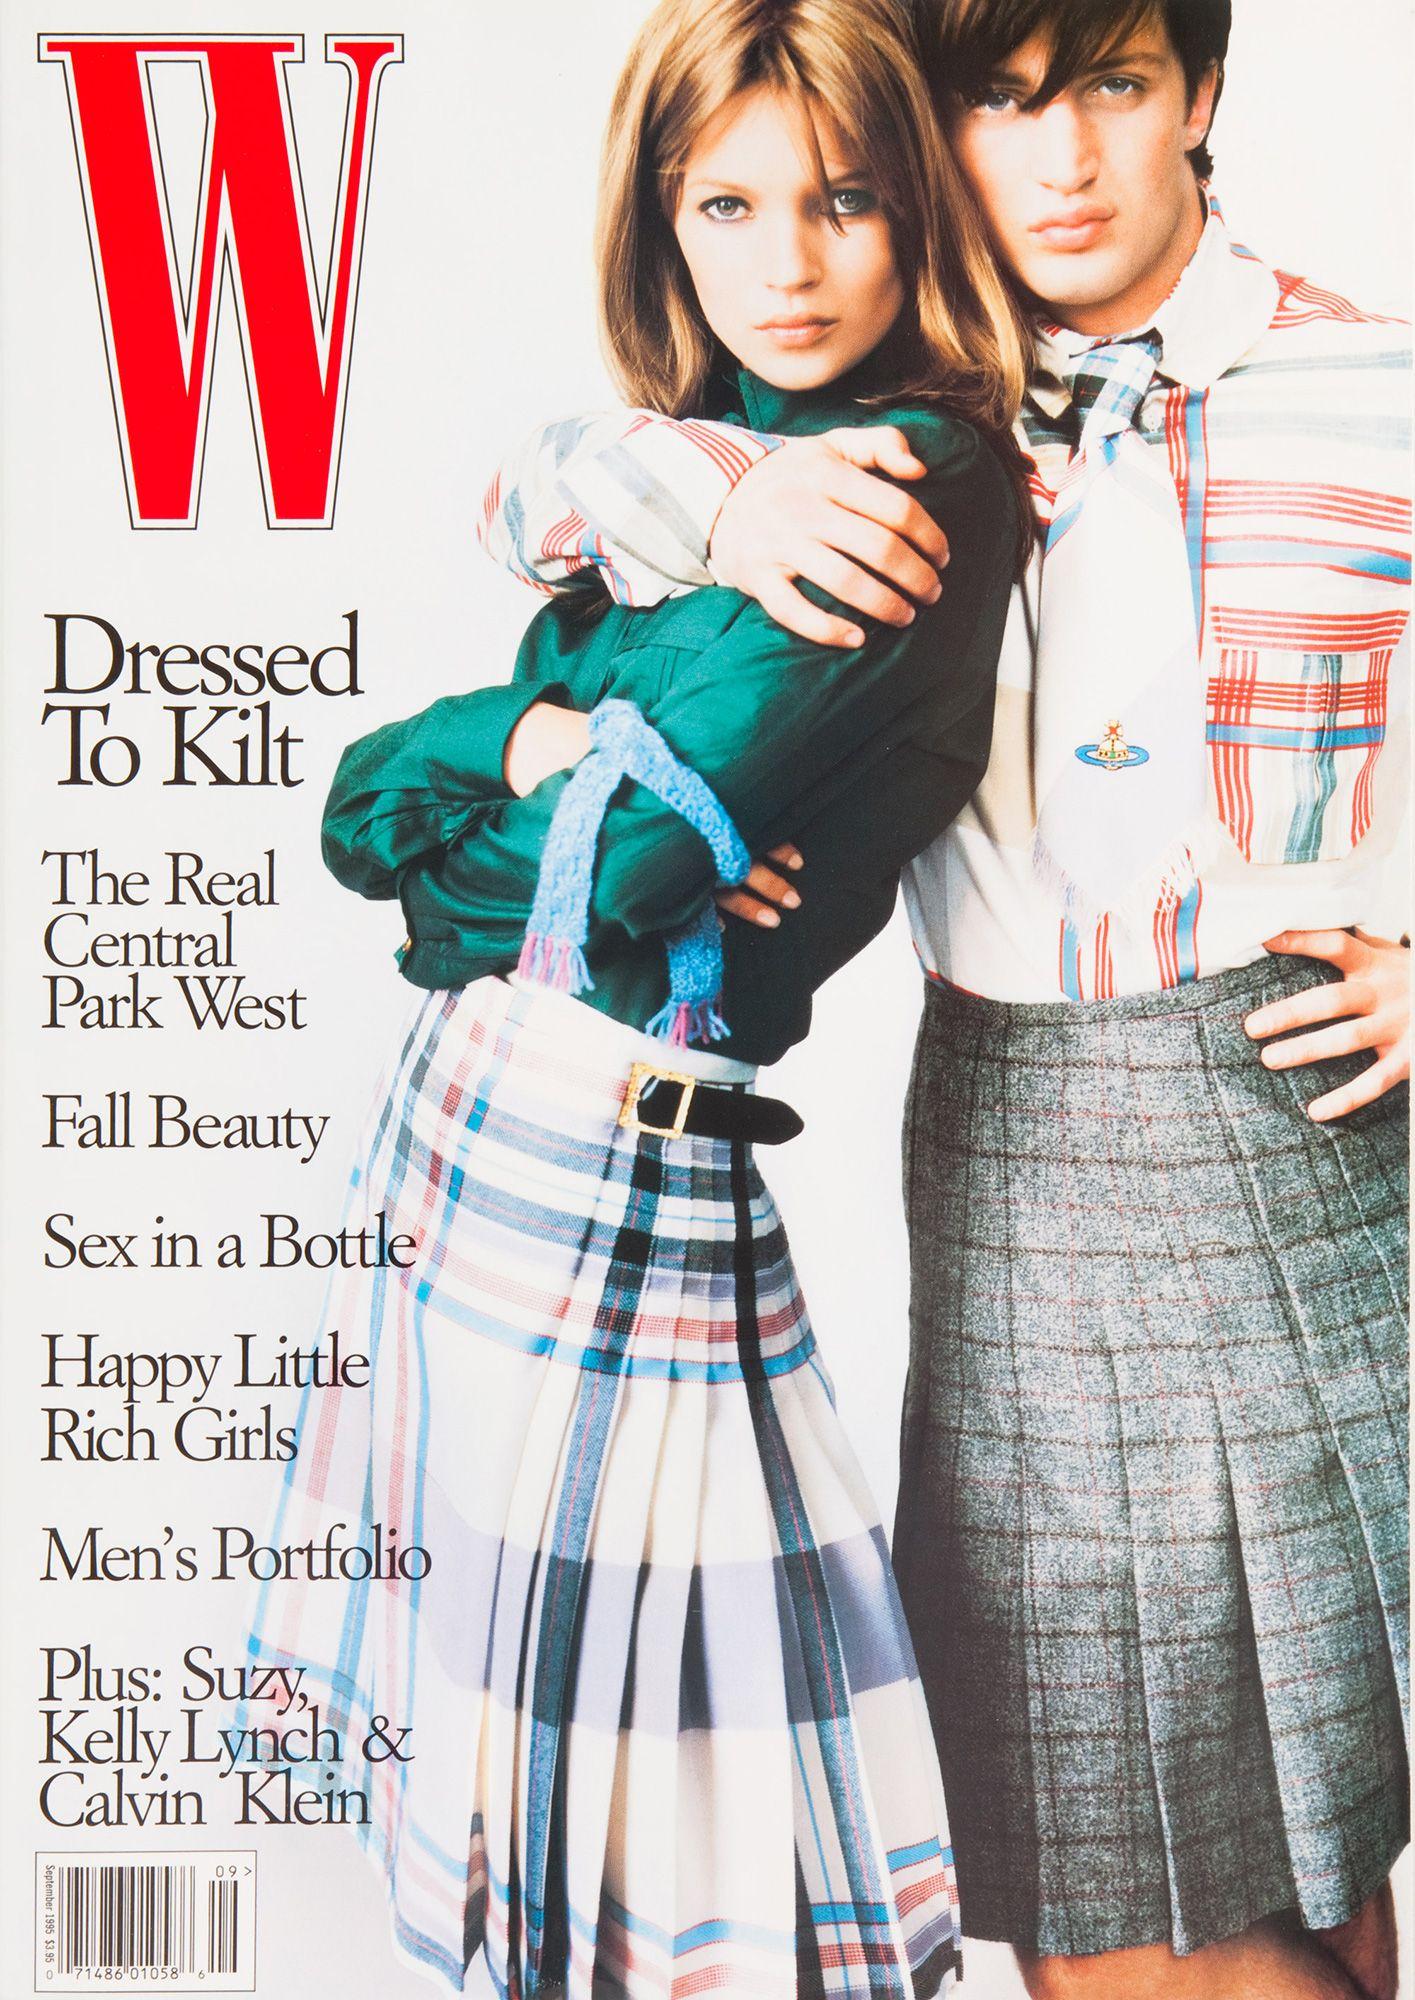 <em>W</em> Magazine's Supermodel Cover Girls - Kate Moss on the cover of W Magazine September 1995-Wmag